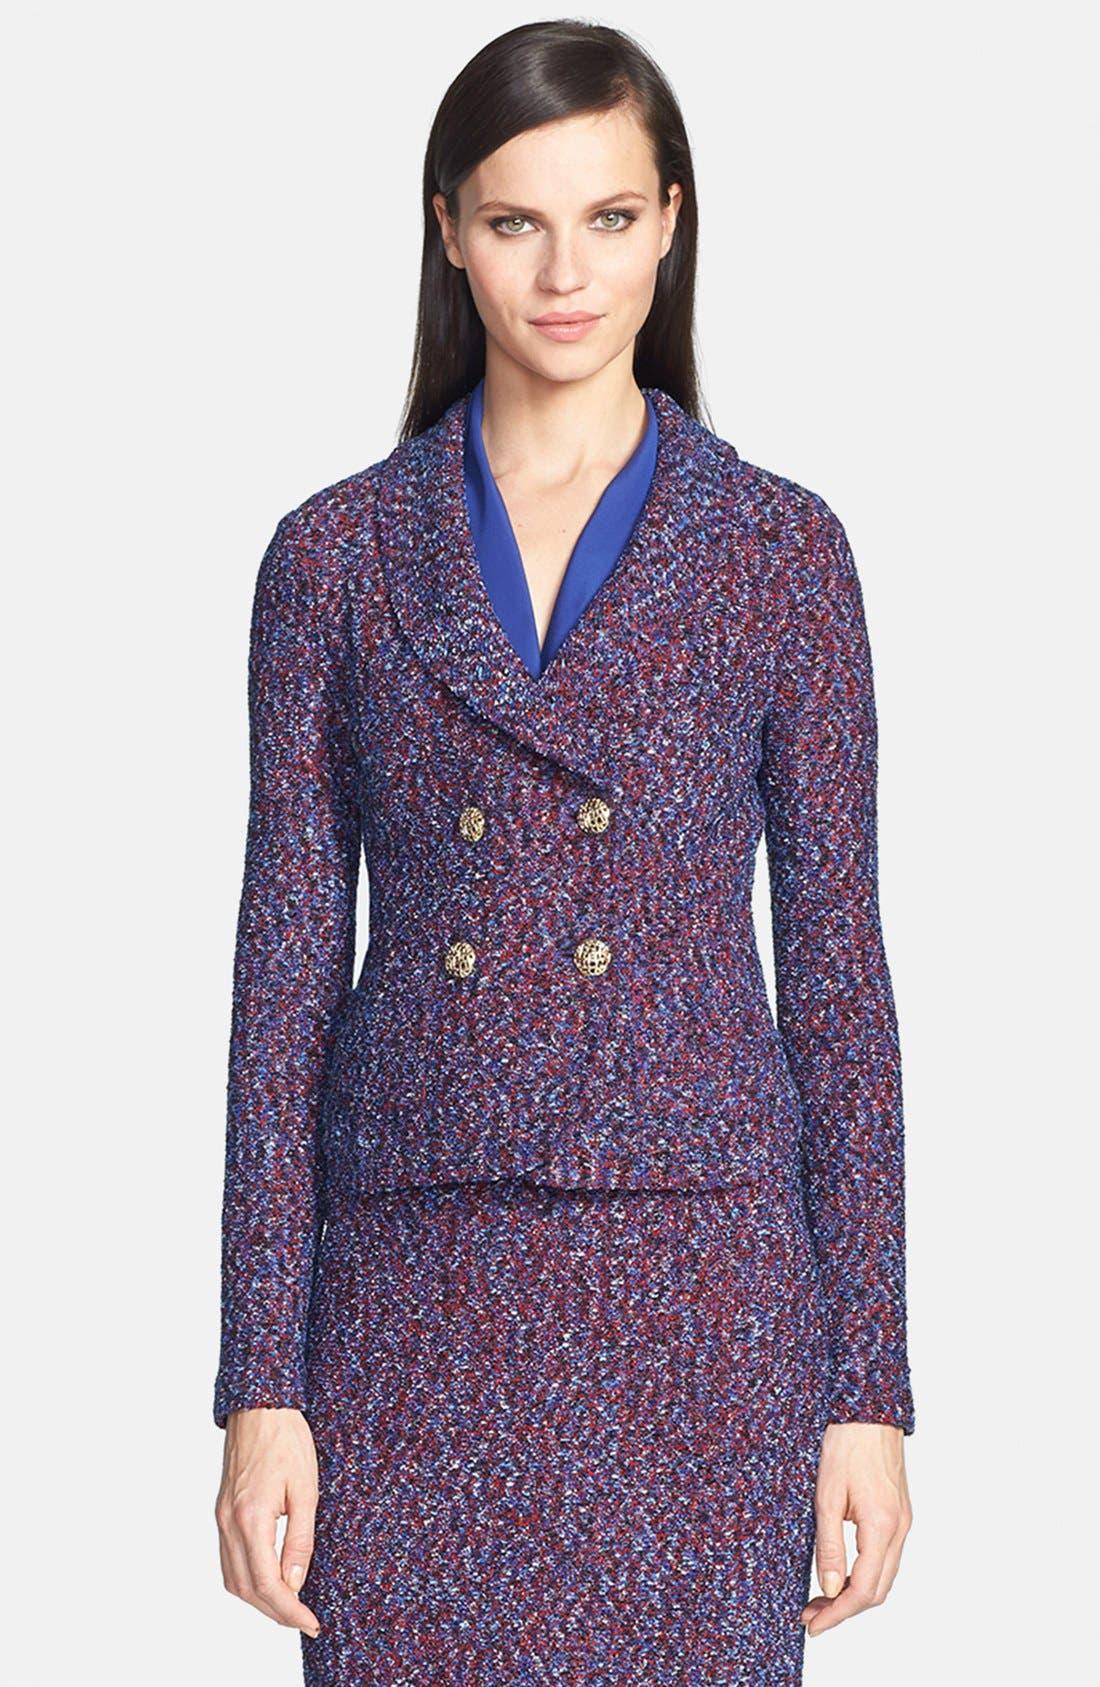 Main Image - St. John Collection Looped Lash Tweed Knit Jacket